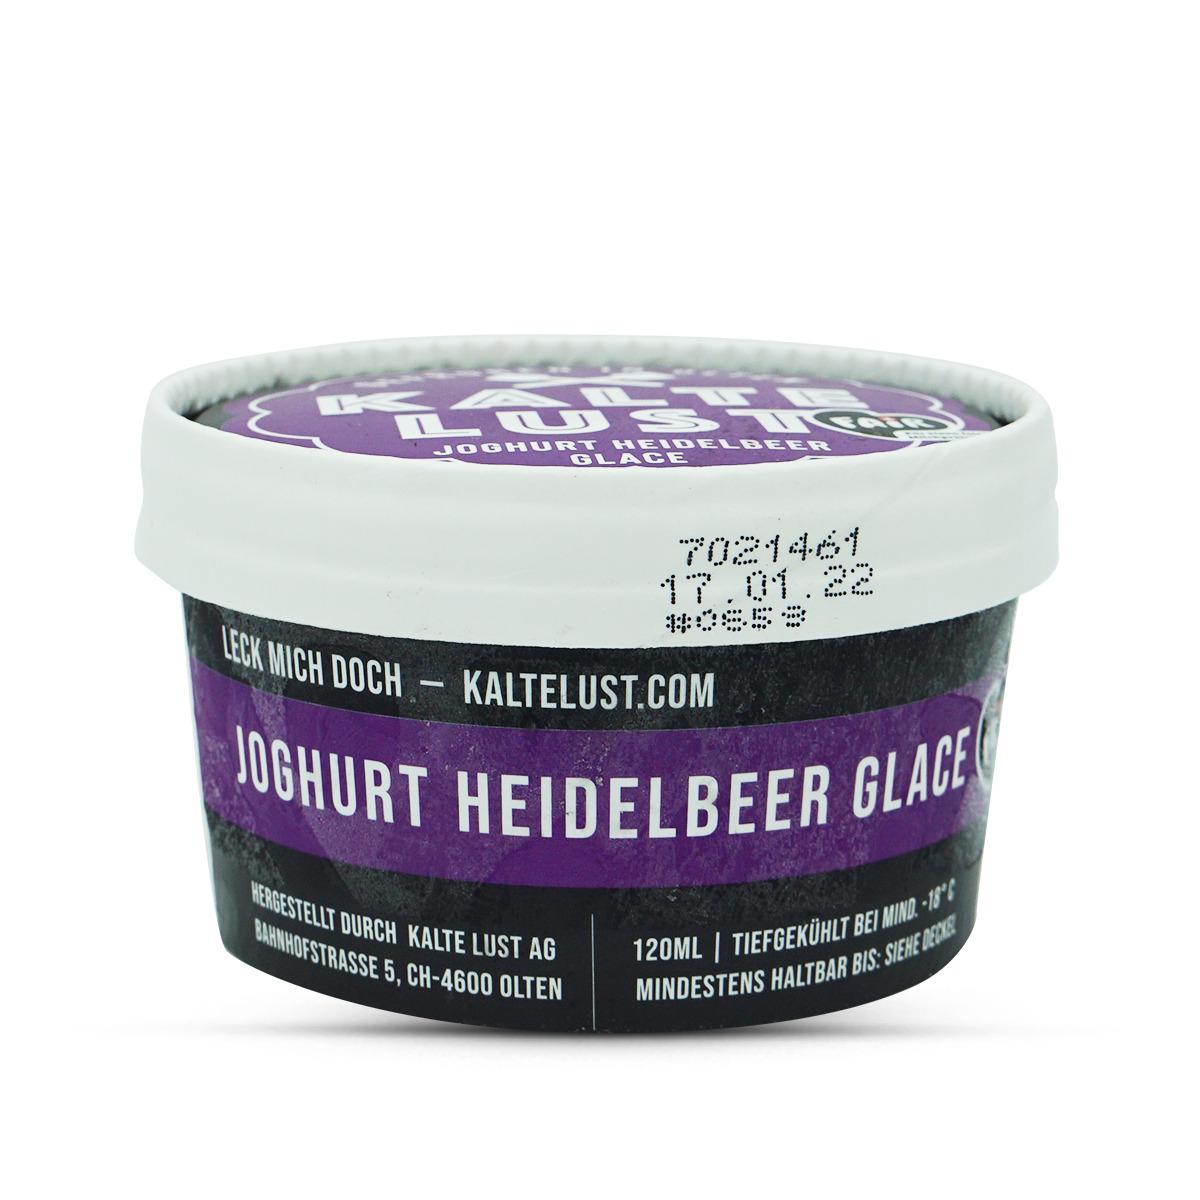 Kalte Lust Glace Joghurt Heidelbeer